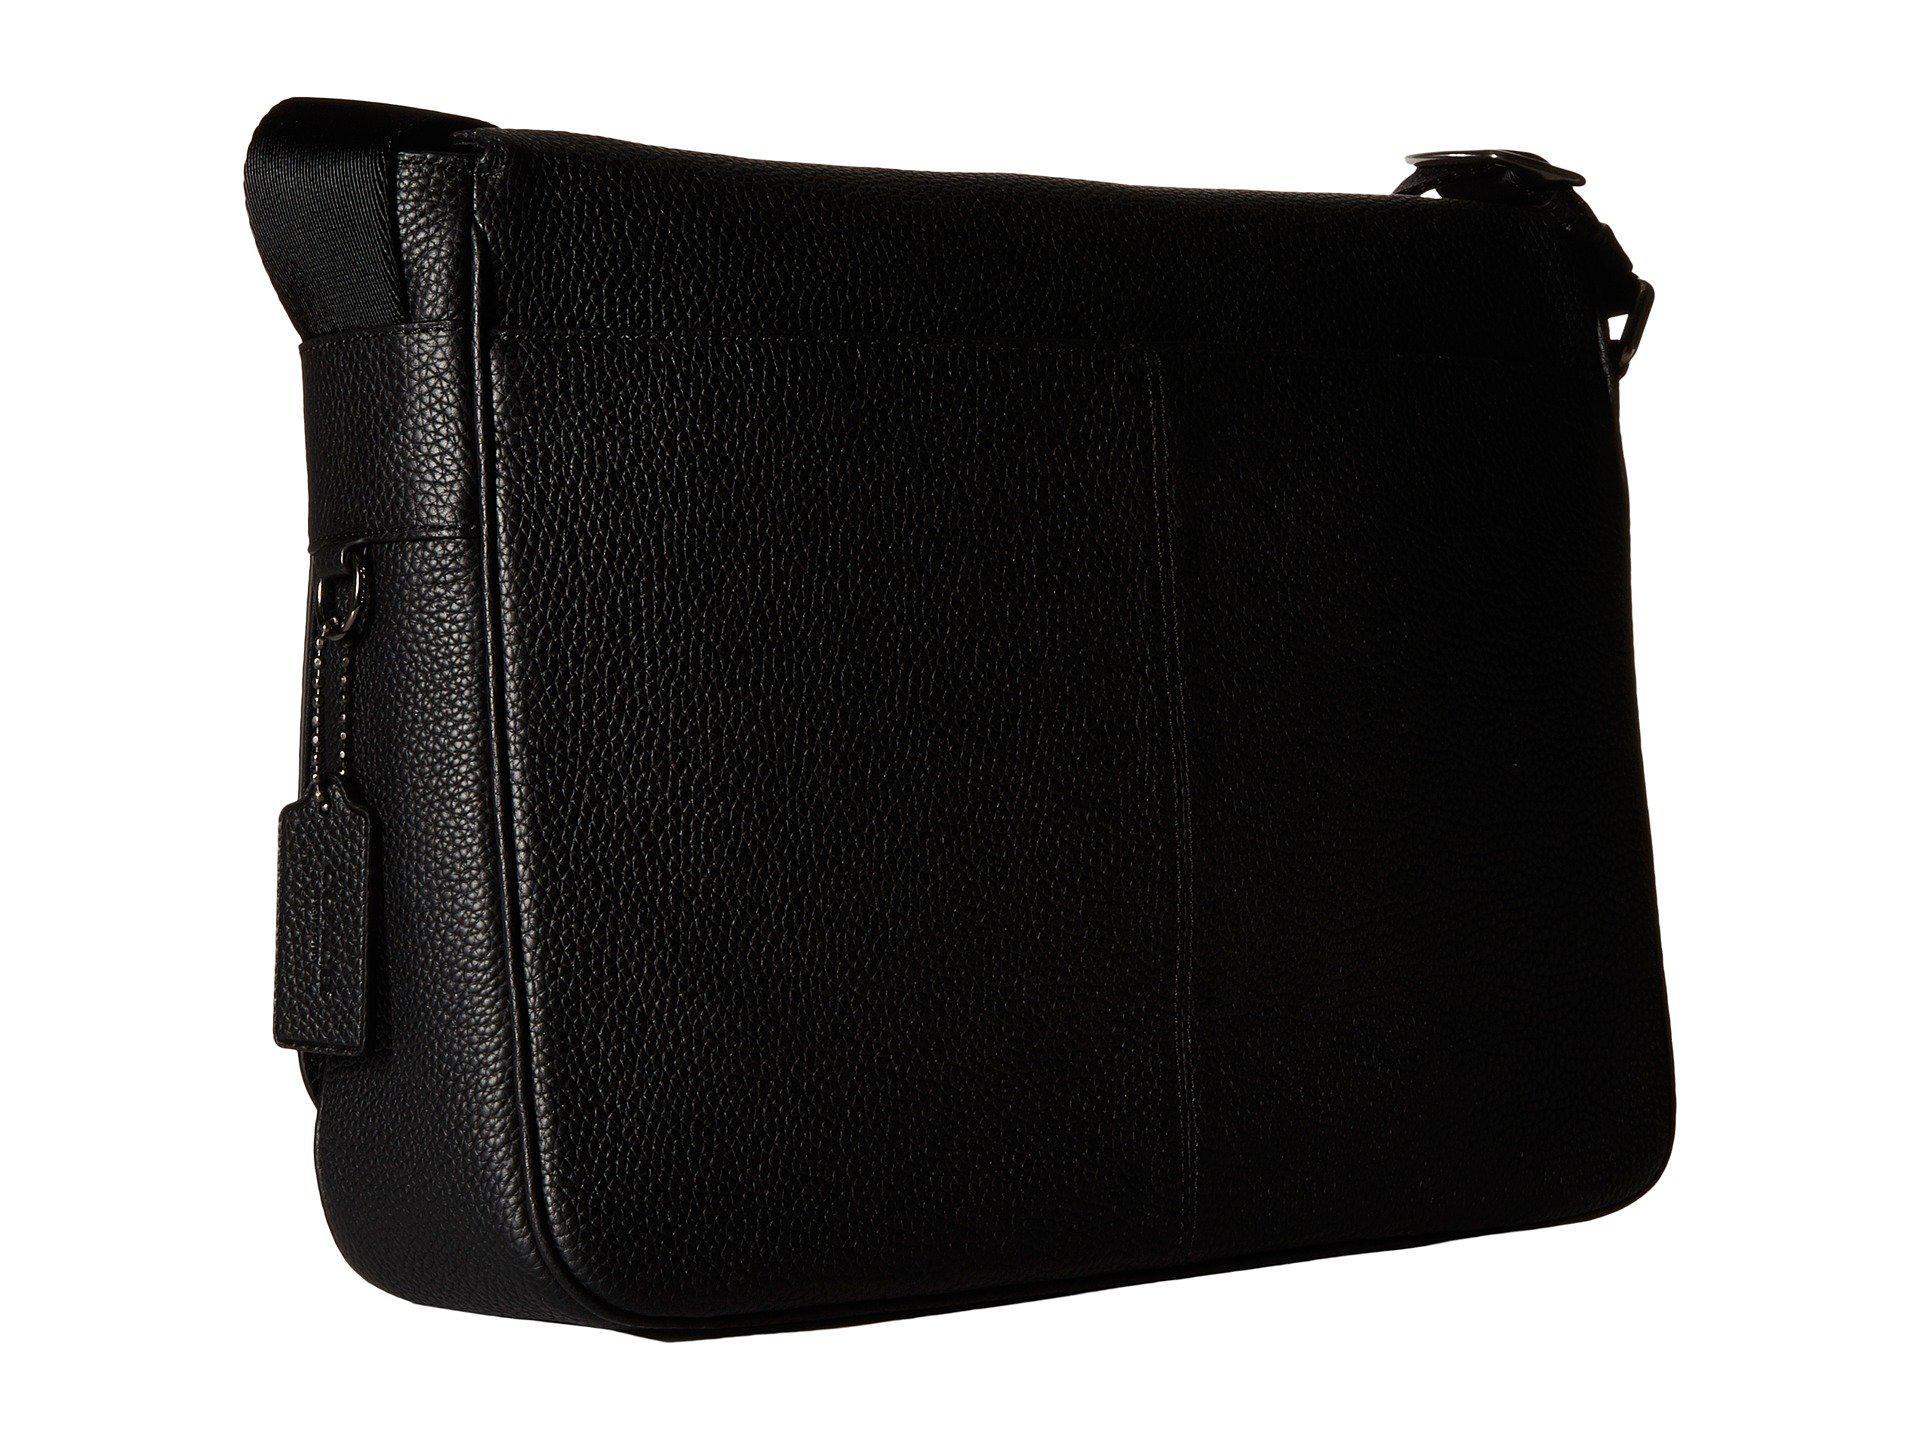 04c6c27b0294 COACH - Pebbled Metropolitan Courier (qb black) Messenger Bags for Men -  Lyst. View fullscreen